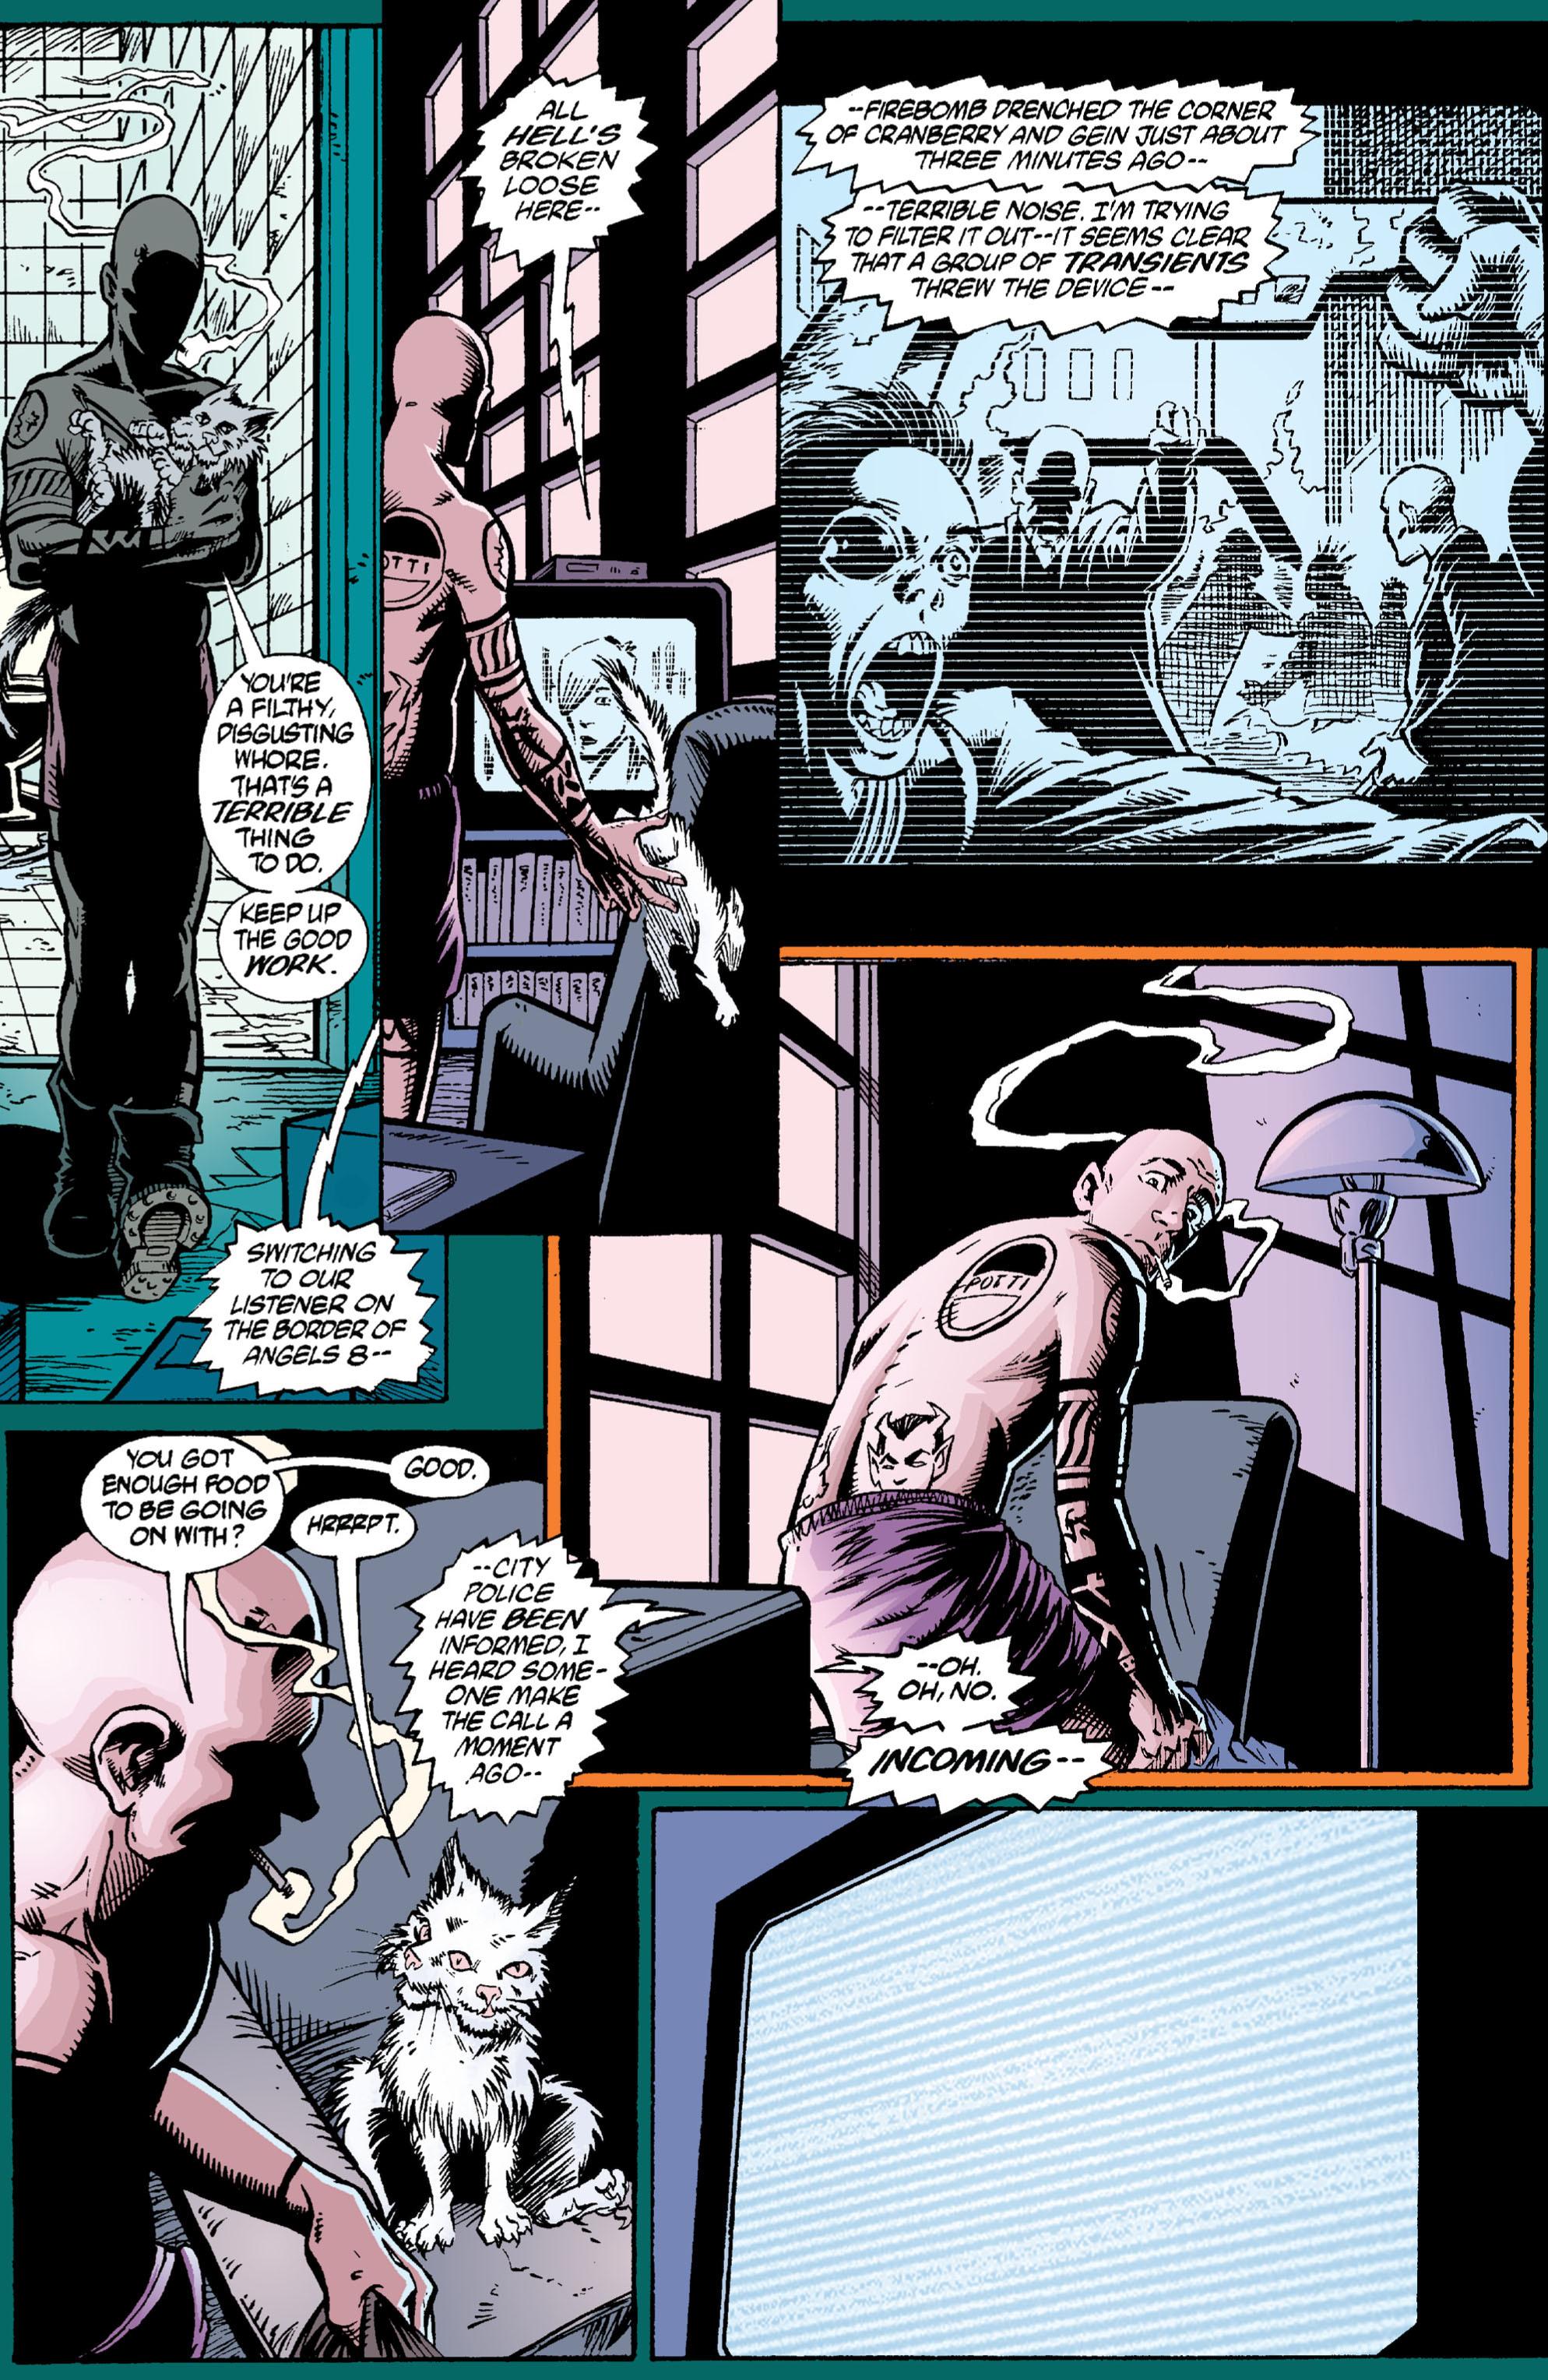 Read online Transmetropolitan comic -  Issue #2 - 22